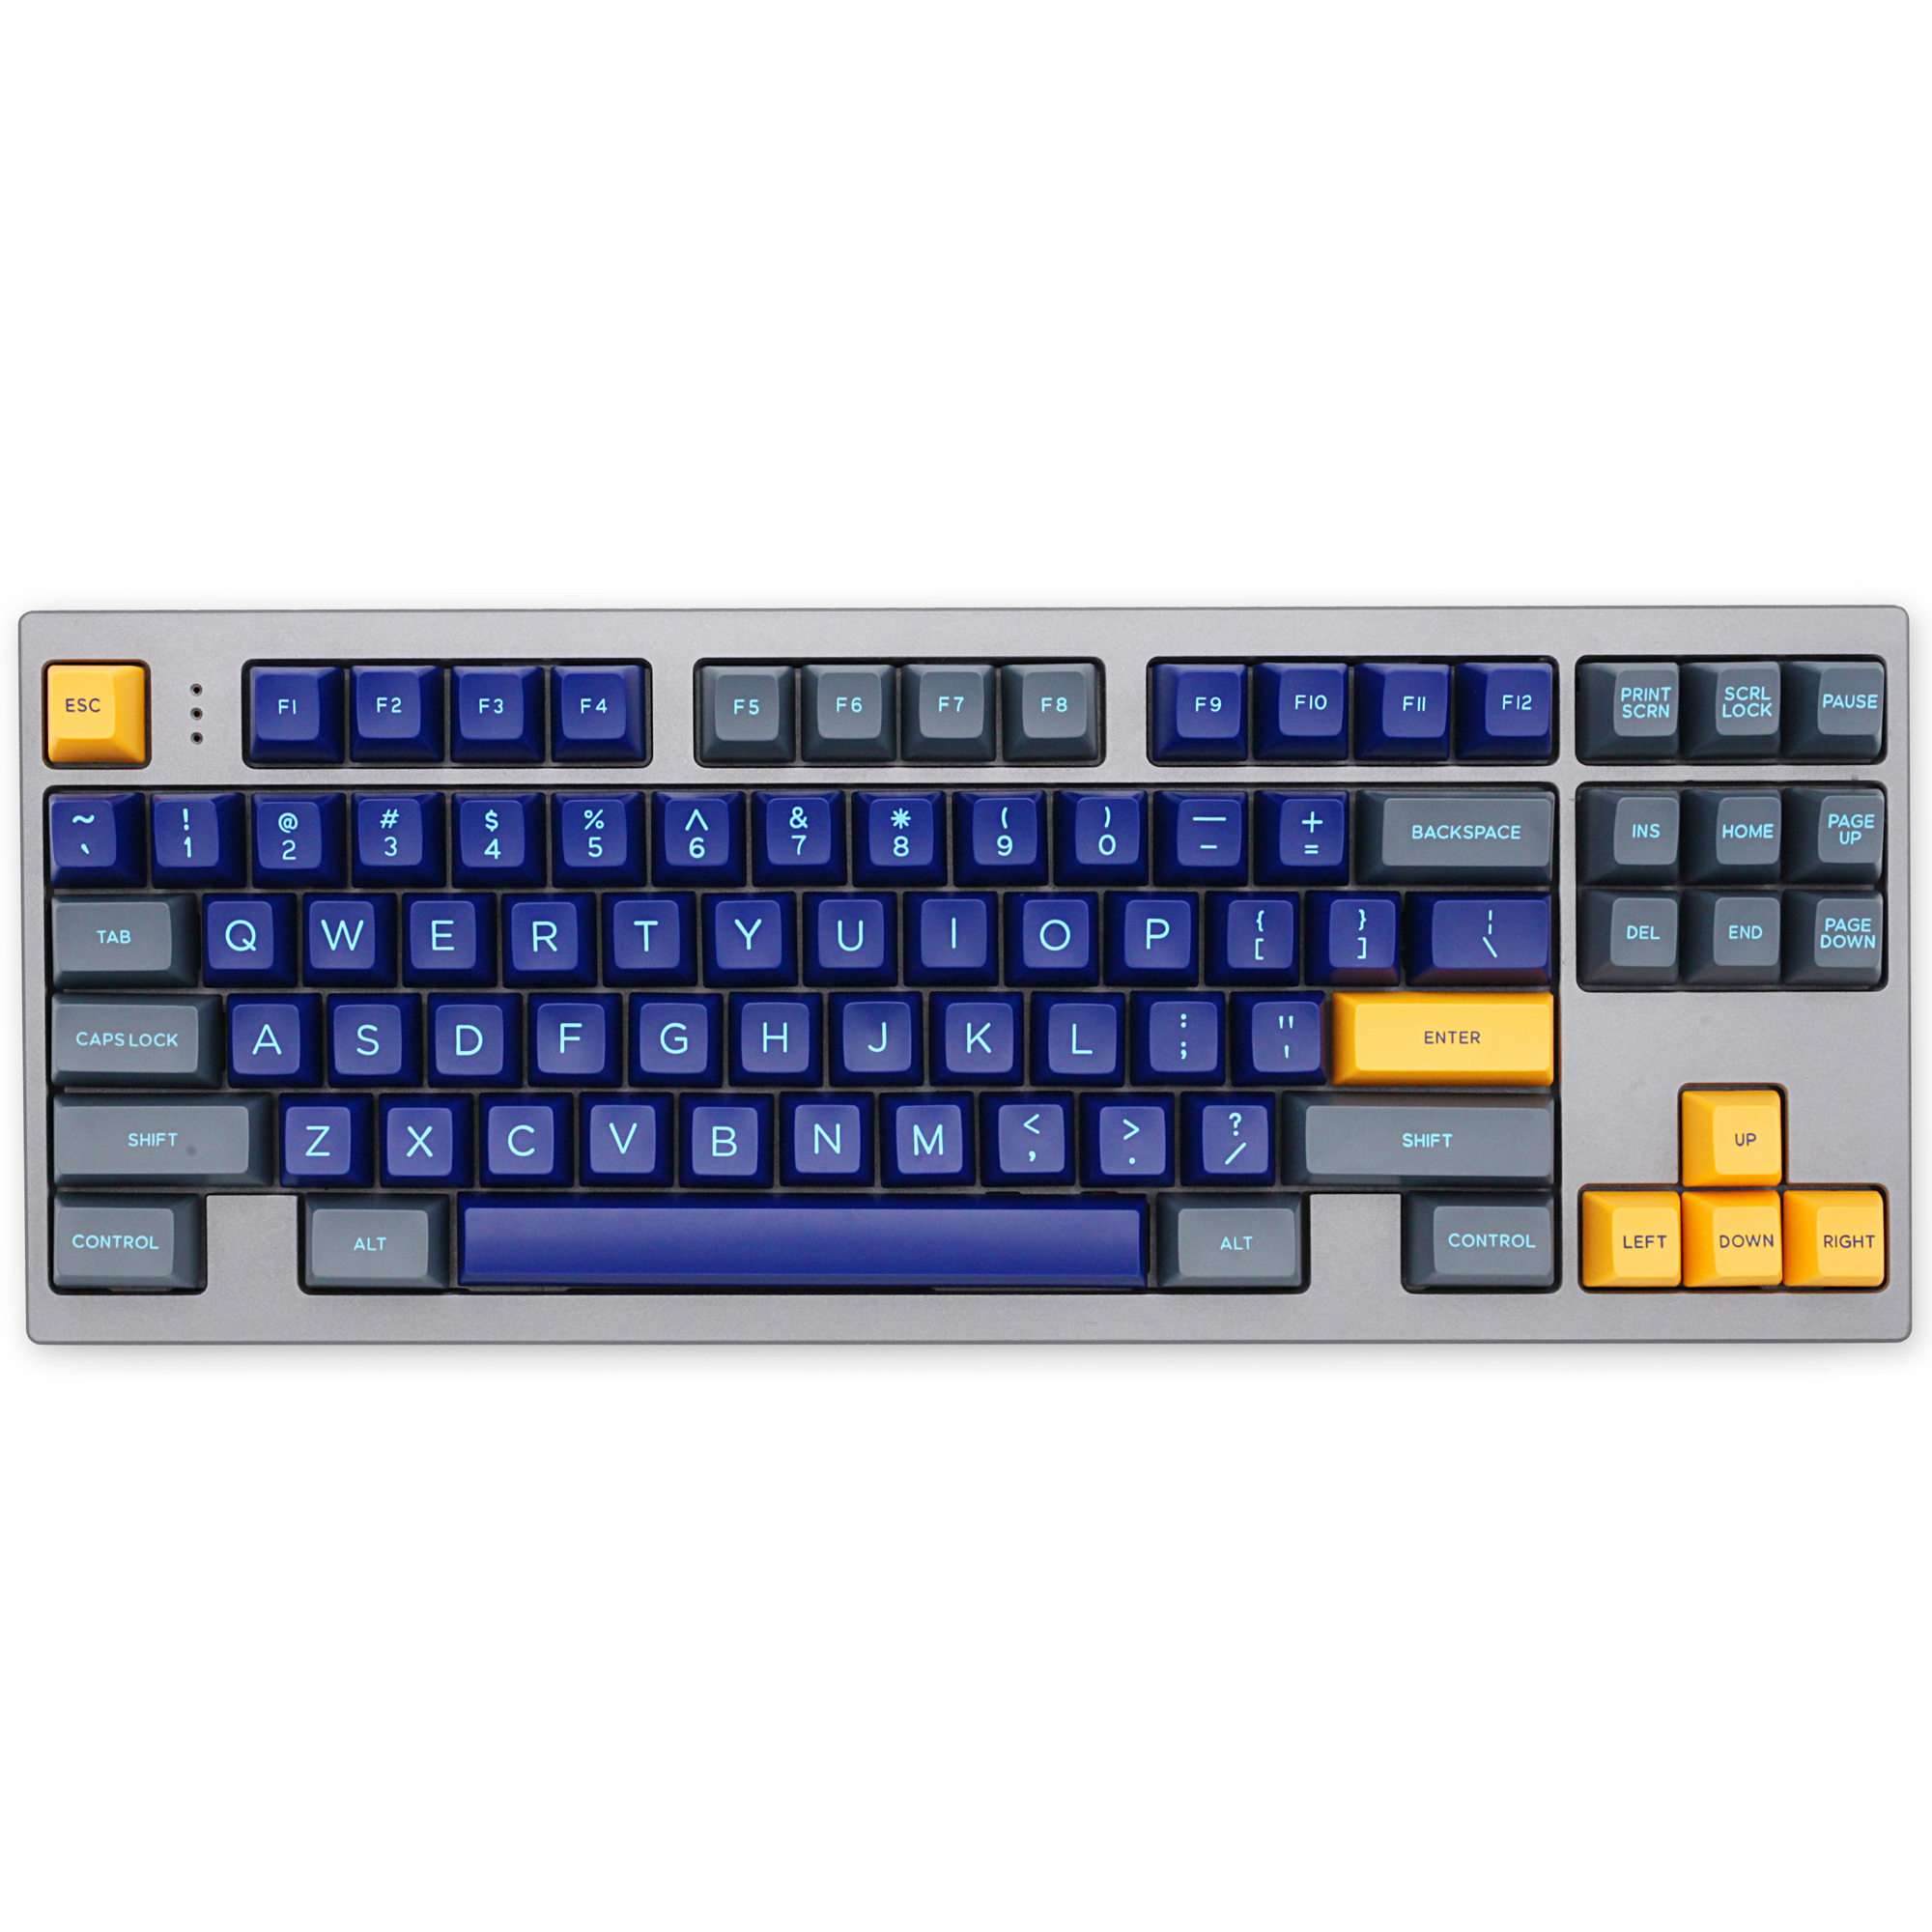 Domikey SA Abs Doubleshot Keycap Set Atlantis SA Profile For Mx Stem Keyboard Poker 87 104 Gh60 Xd64 Xd68 Xd84 Xd96 Xd75 Xd87